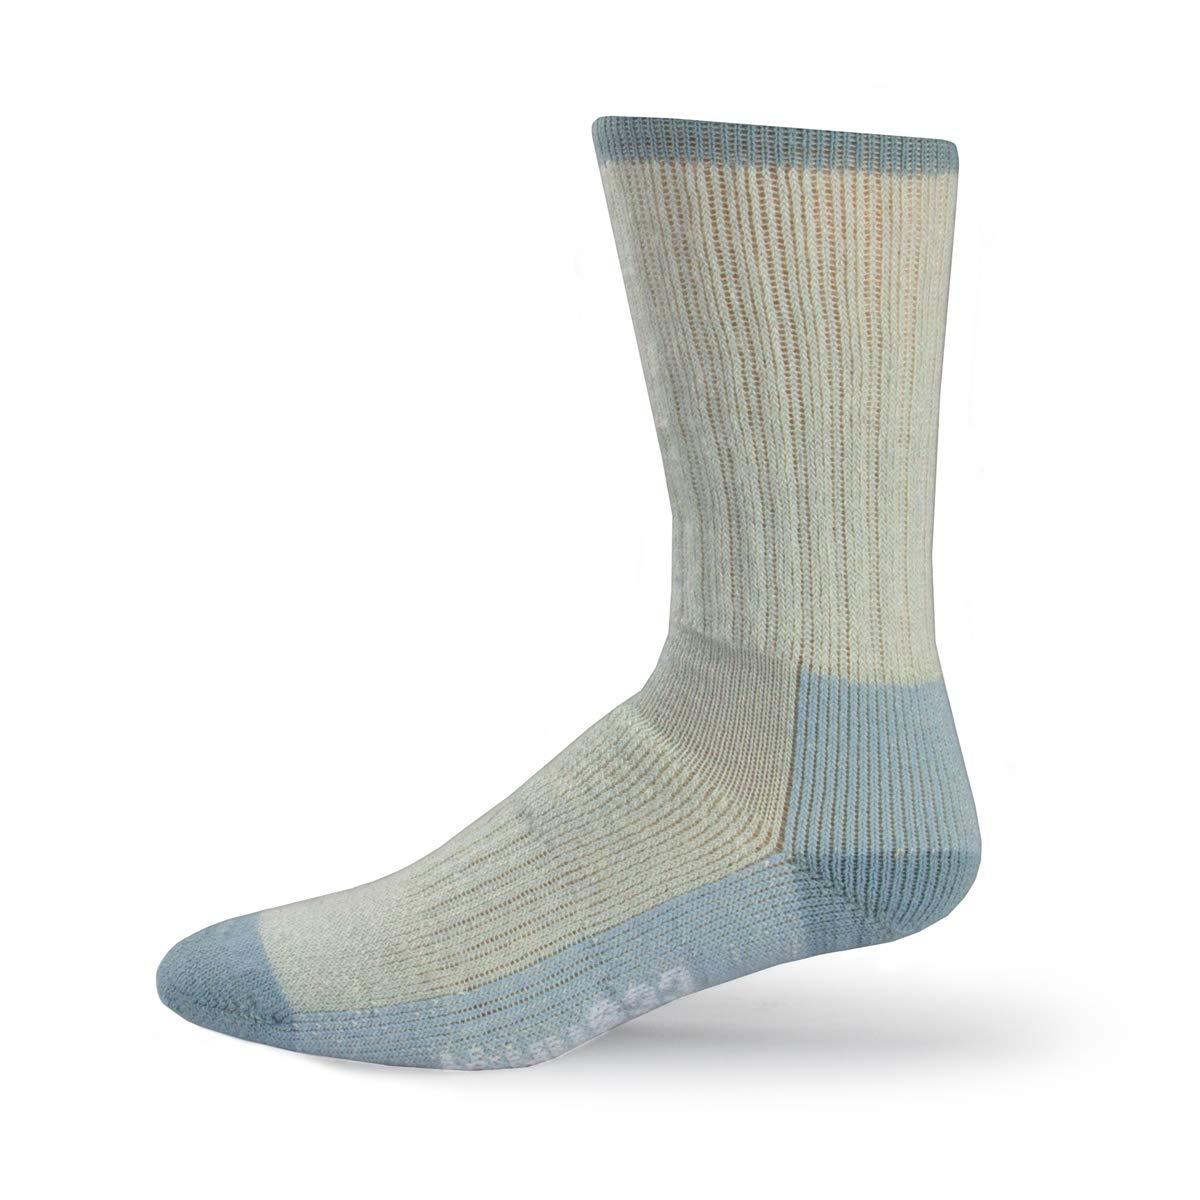 Minus33 Merino Wool 903 Day Hiker Sock Powder Blue Small by Minus33 Merino Wool